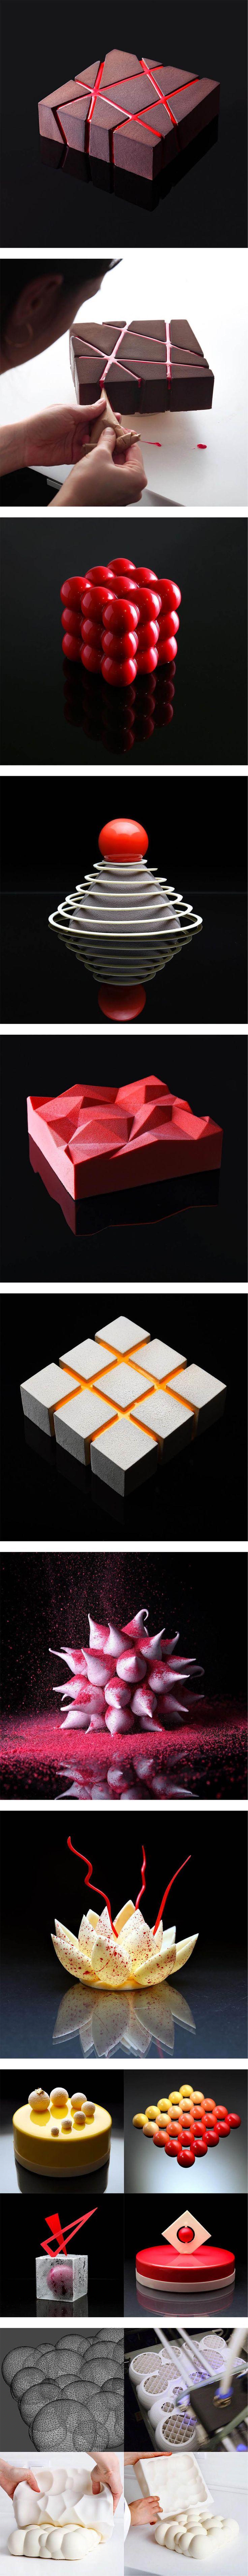 Unusual Geometric Cake Designs by Dinara Kasko